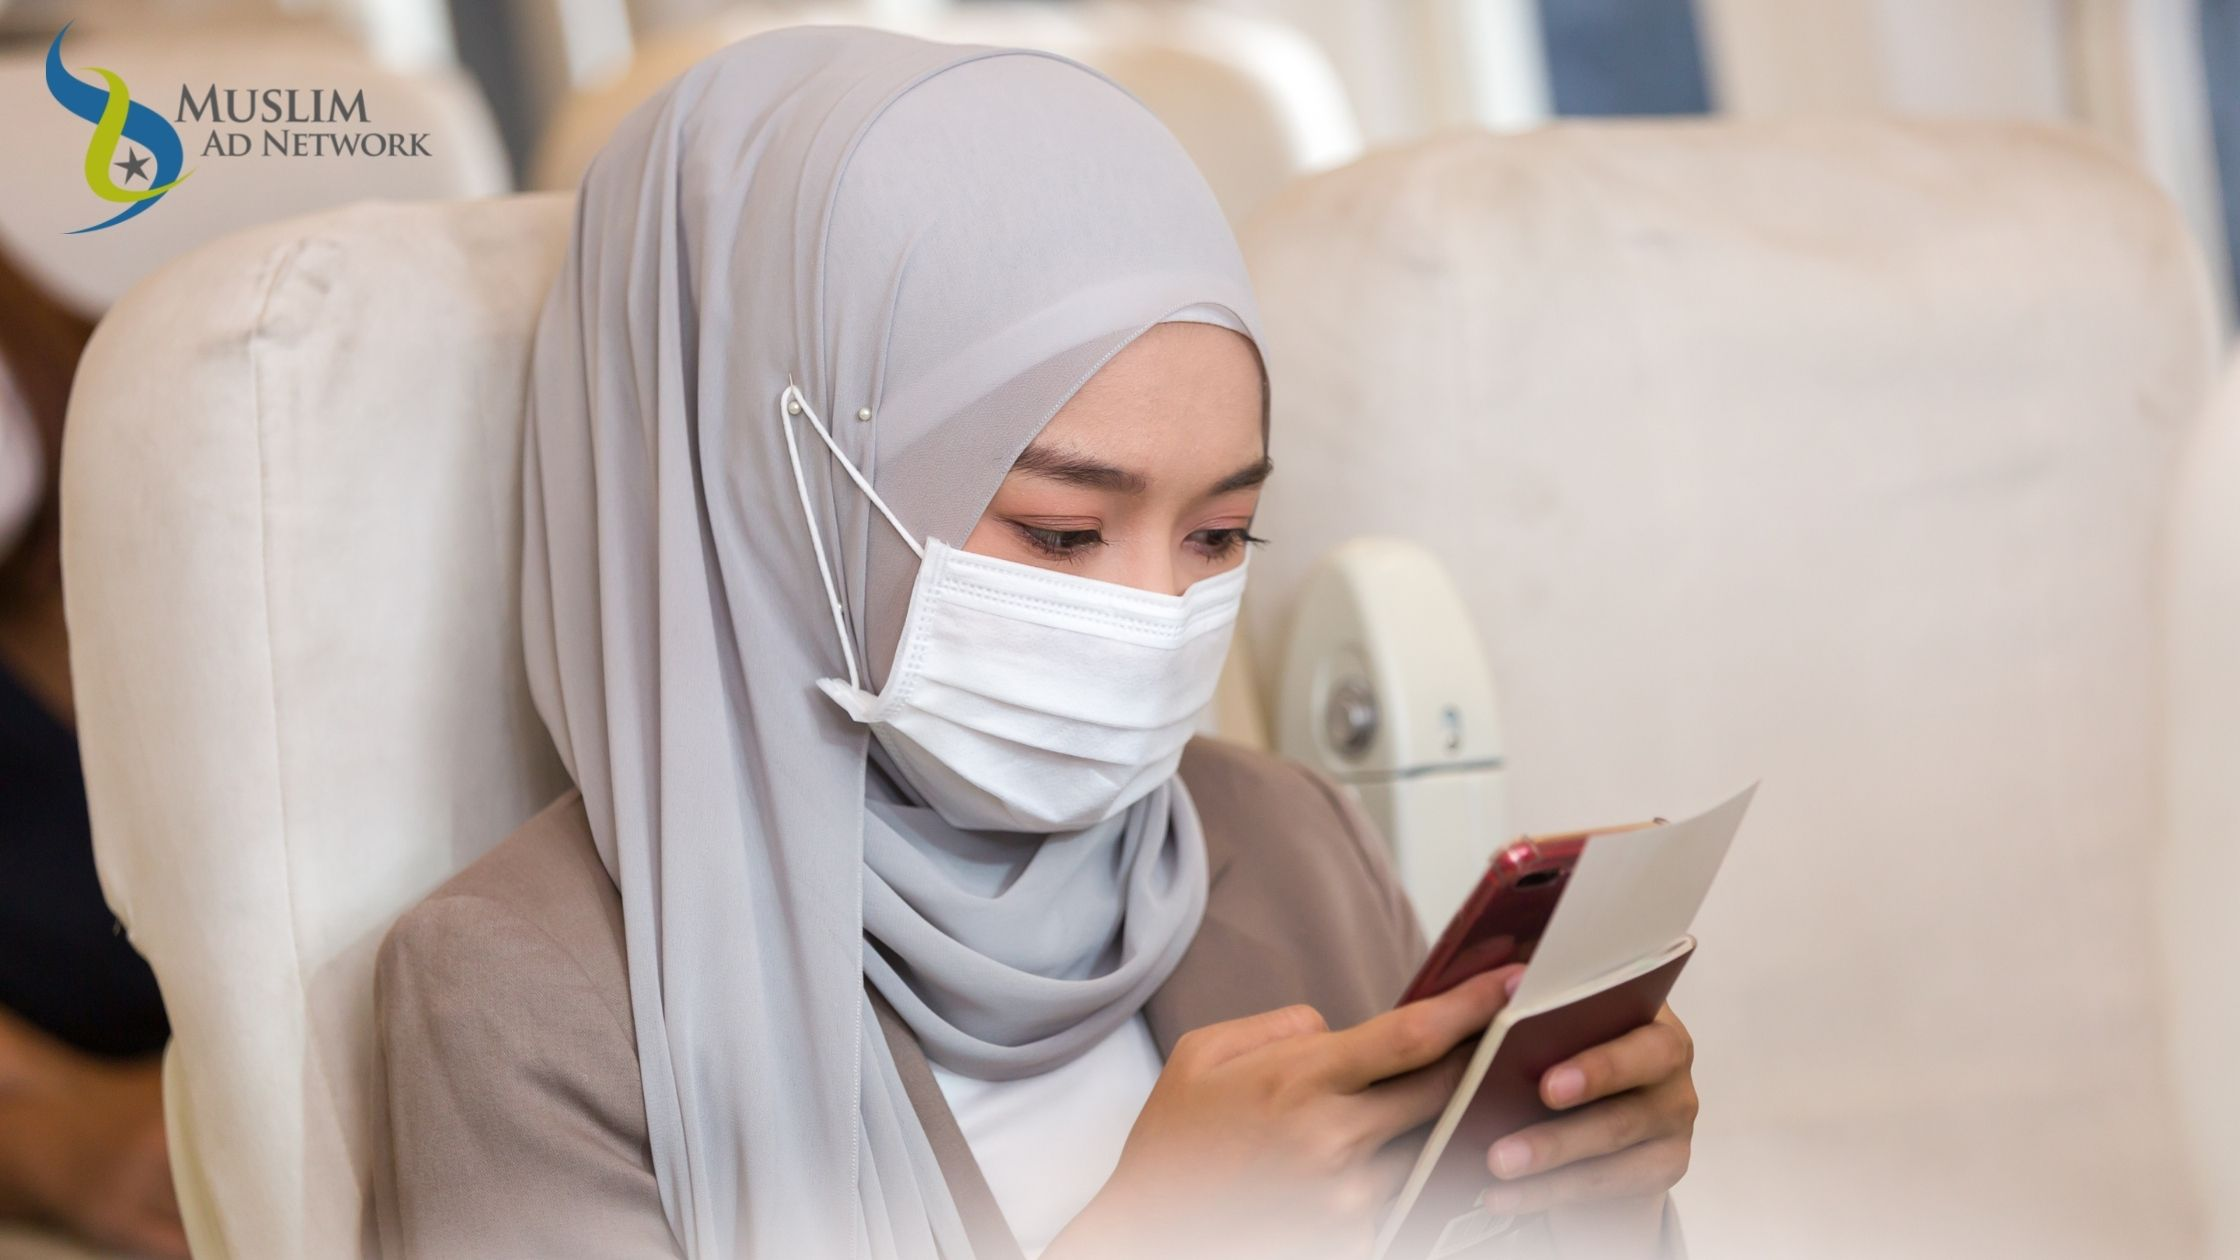 advertise halal tourism